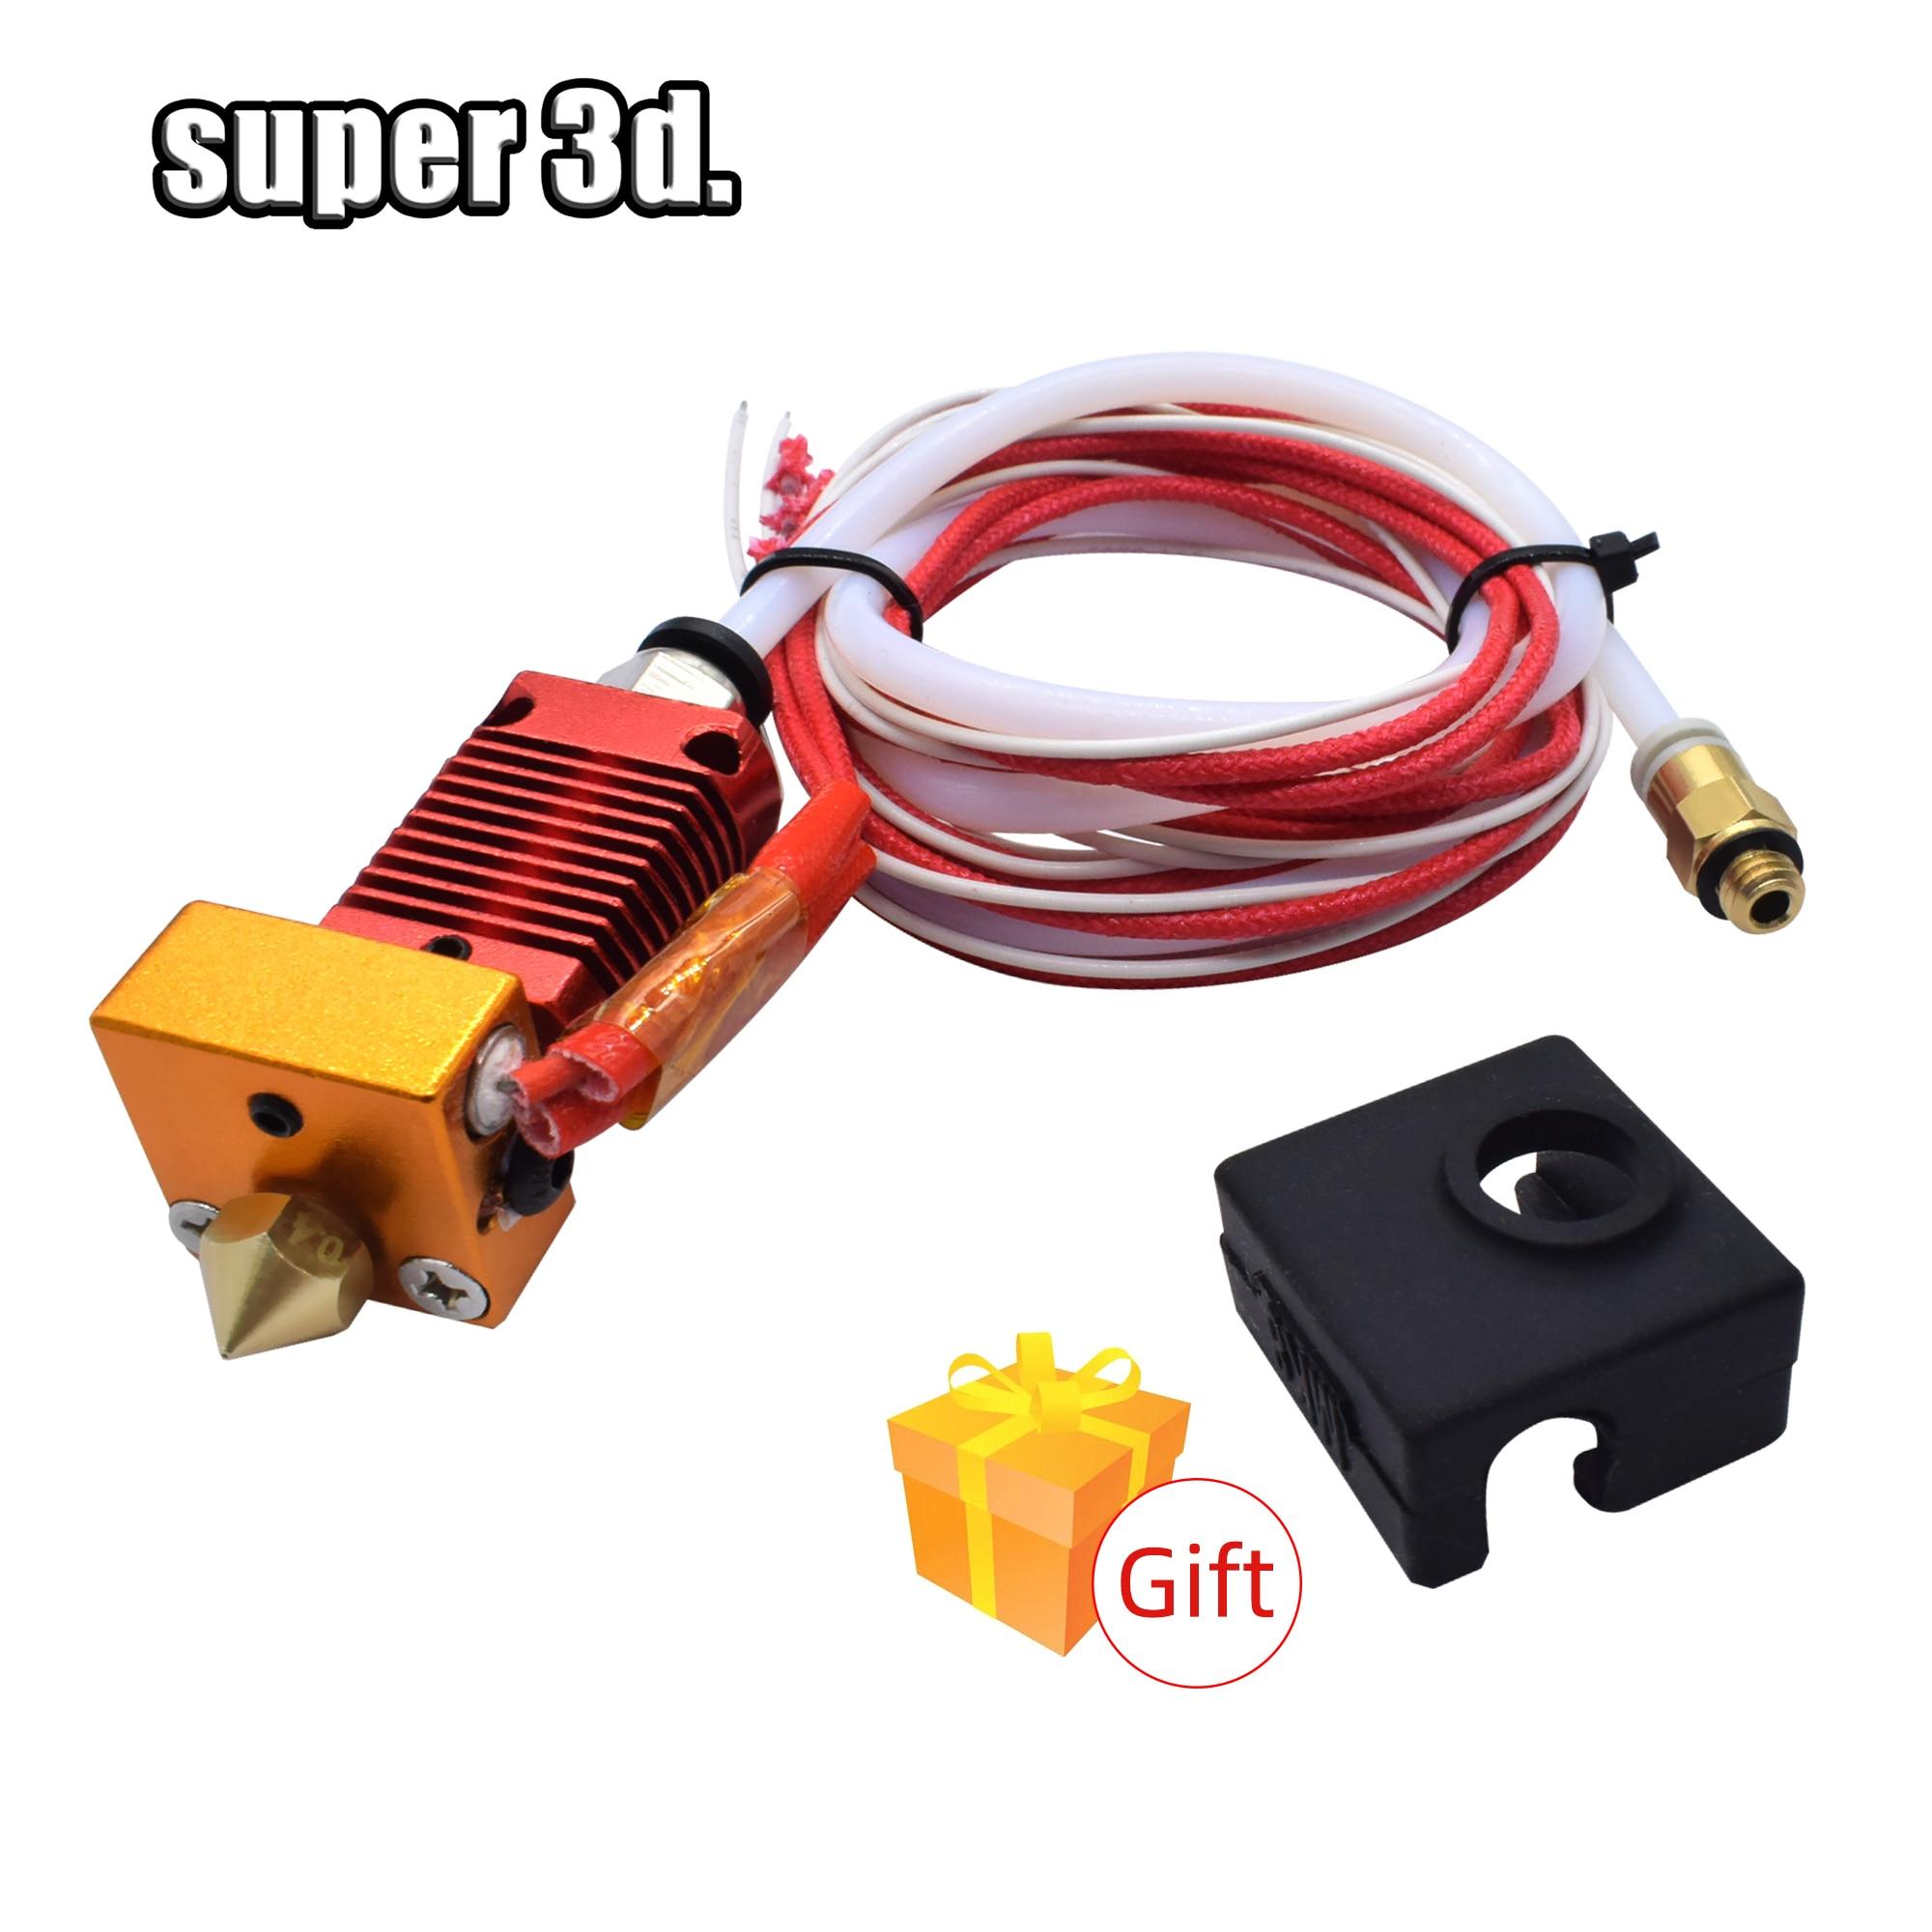 3D Volle Metall J-kopf CR10 Hotend Extrudieren Hot End Kit für creality Ender-3/5 pro CR10 10s Bowden Extruder 12/24V 3D Drucker Teile